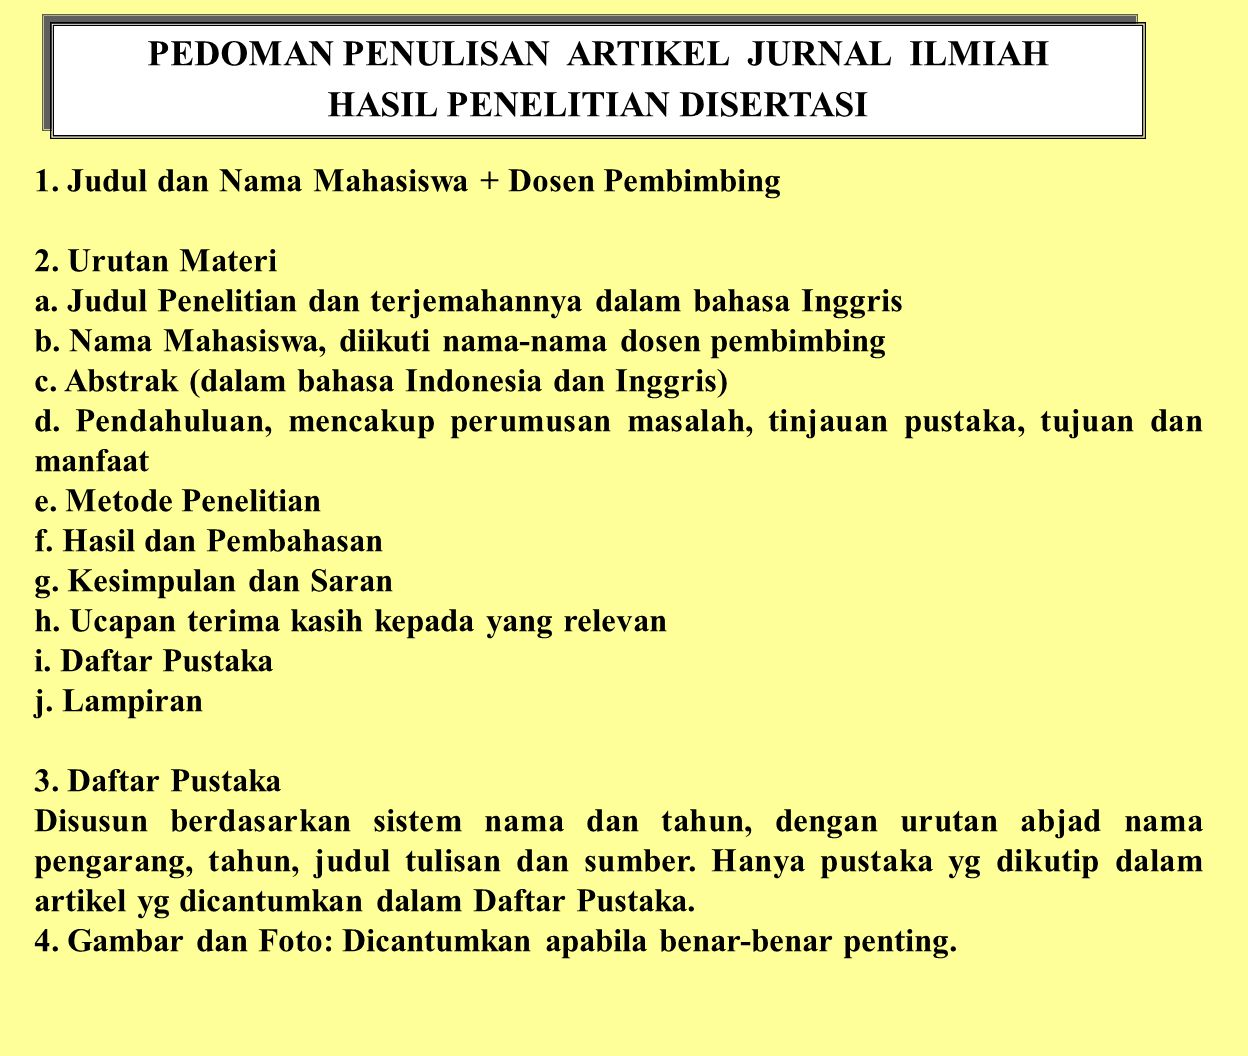 PEDOMAN PENULISAN ARTIKEL JURNAL ILMIAH